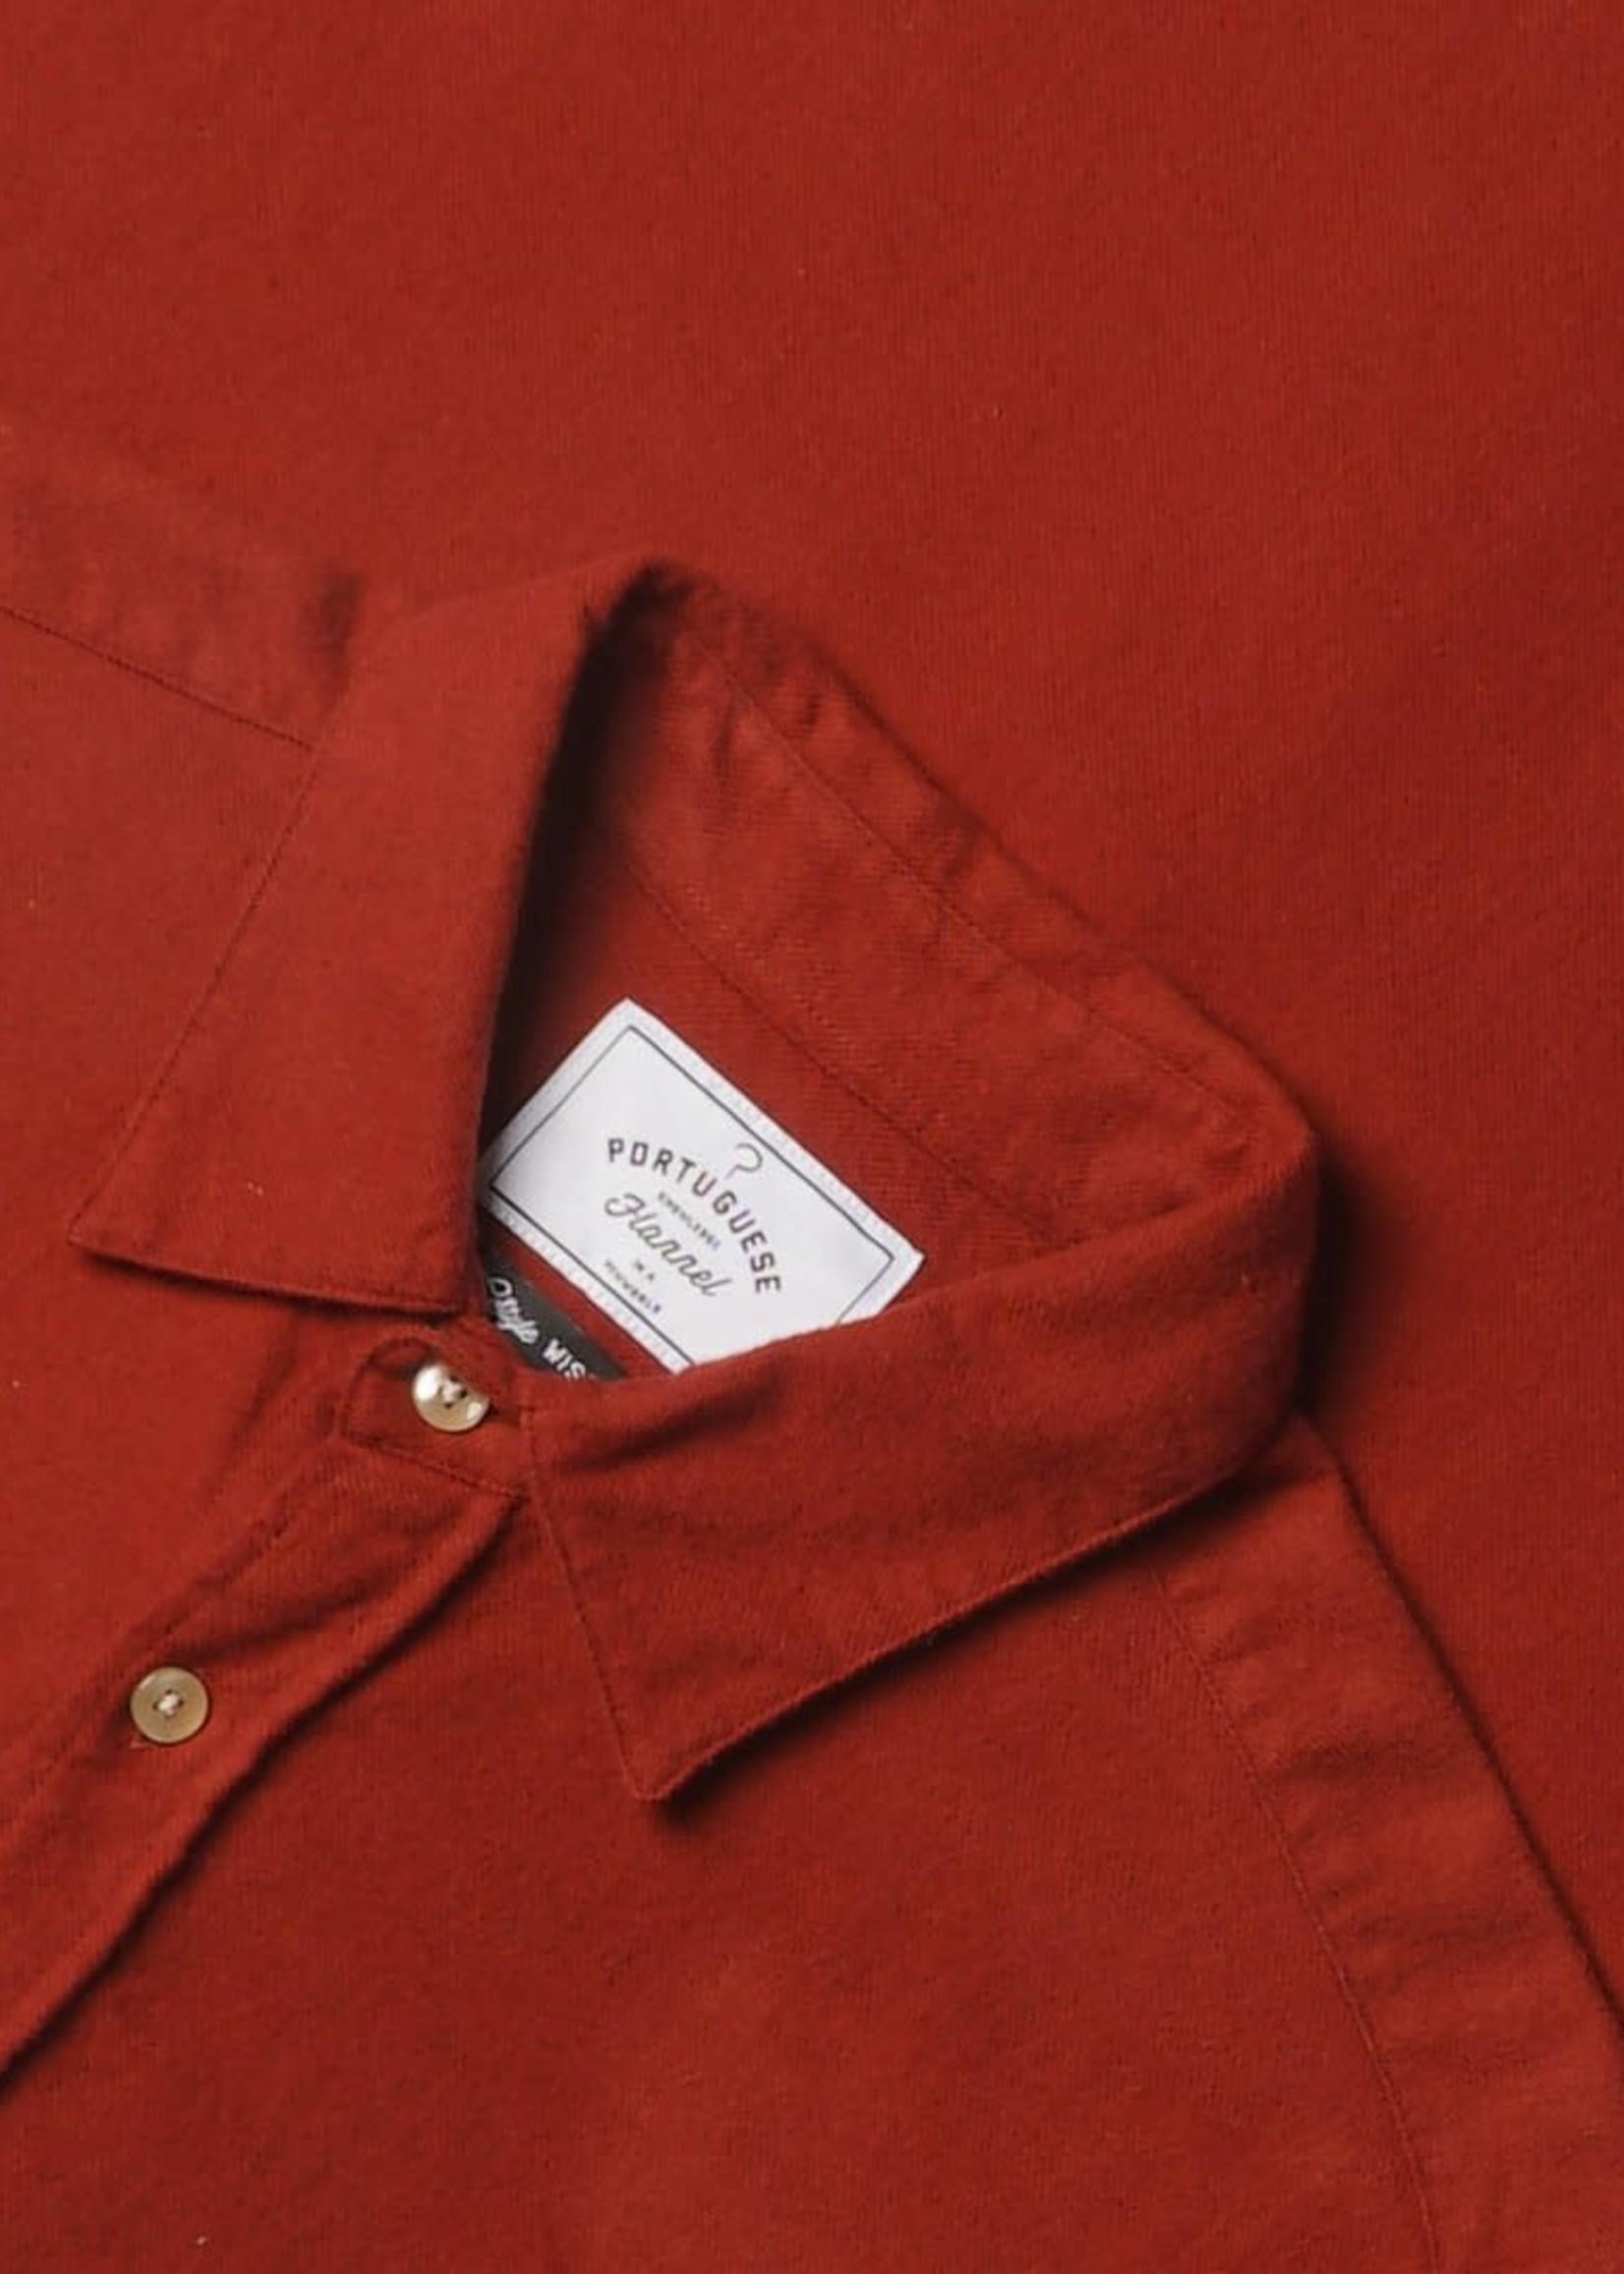 Portuguese Flannel Portuguese Flannel Teca Merlot Flannel Sport Shirt